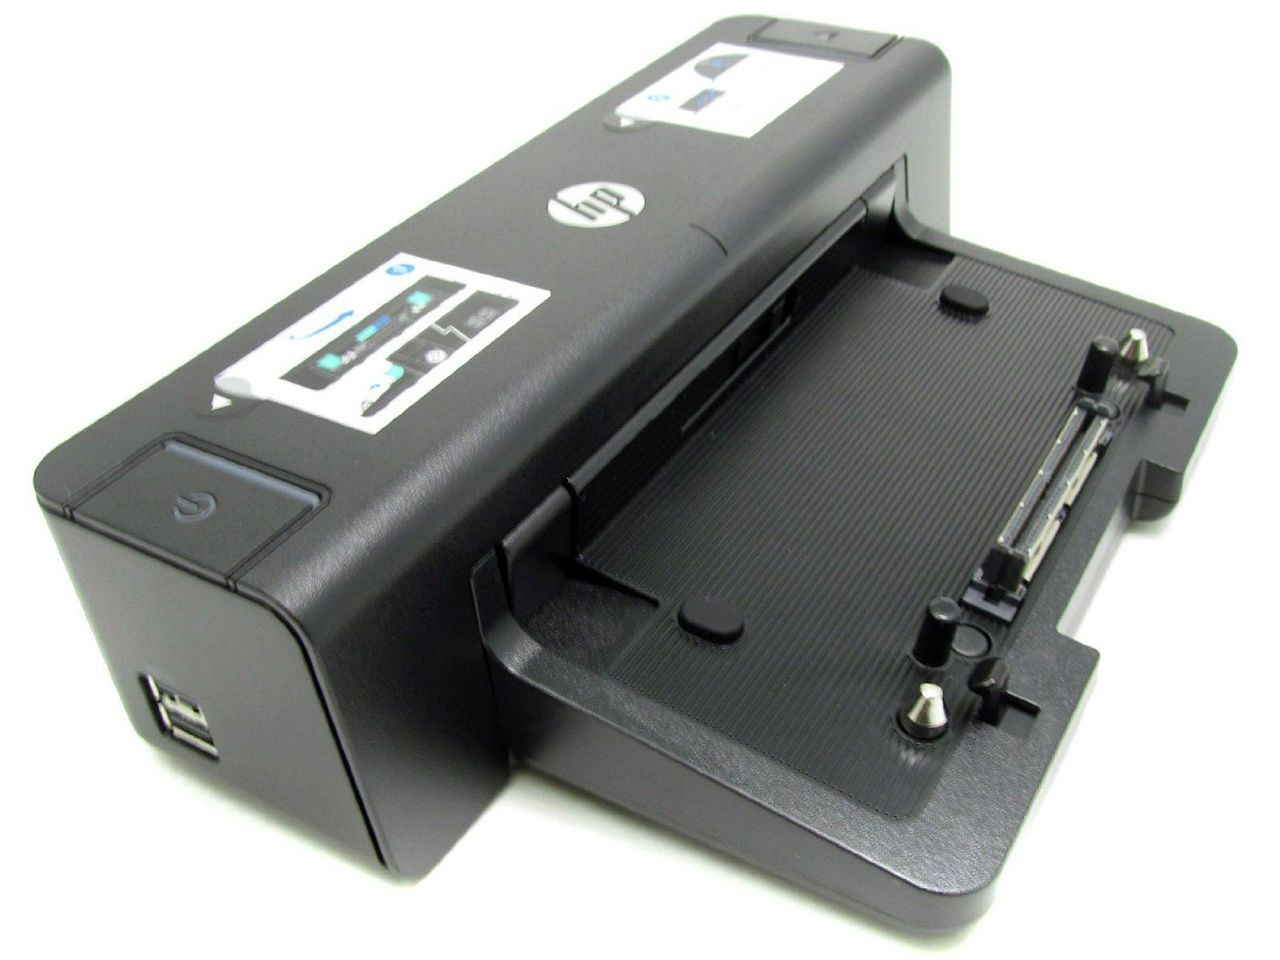 New Genuine HP Elitebook Probook Docking Station Port Replicator 688169-001